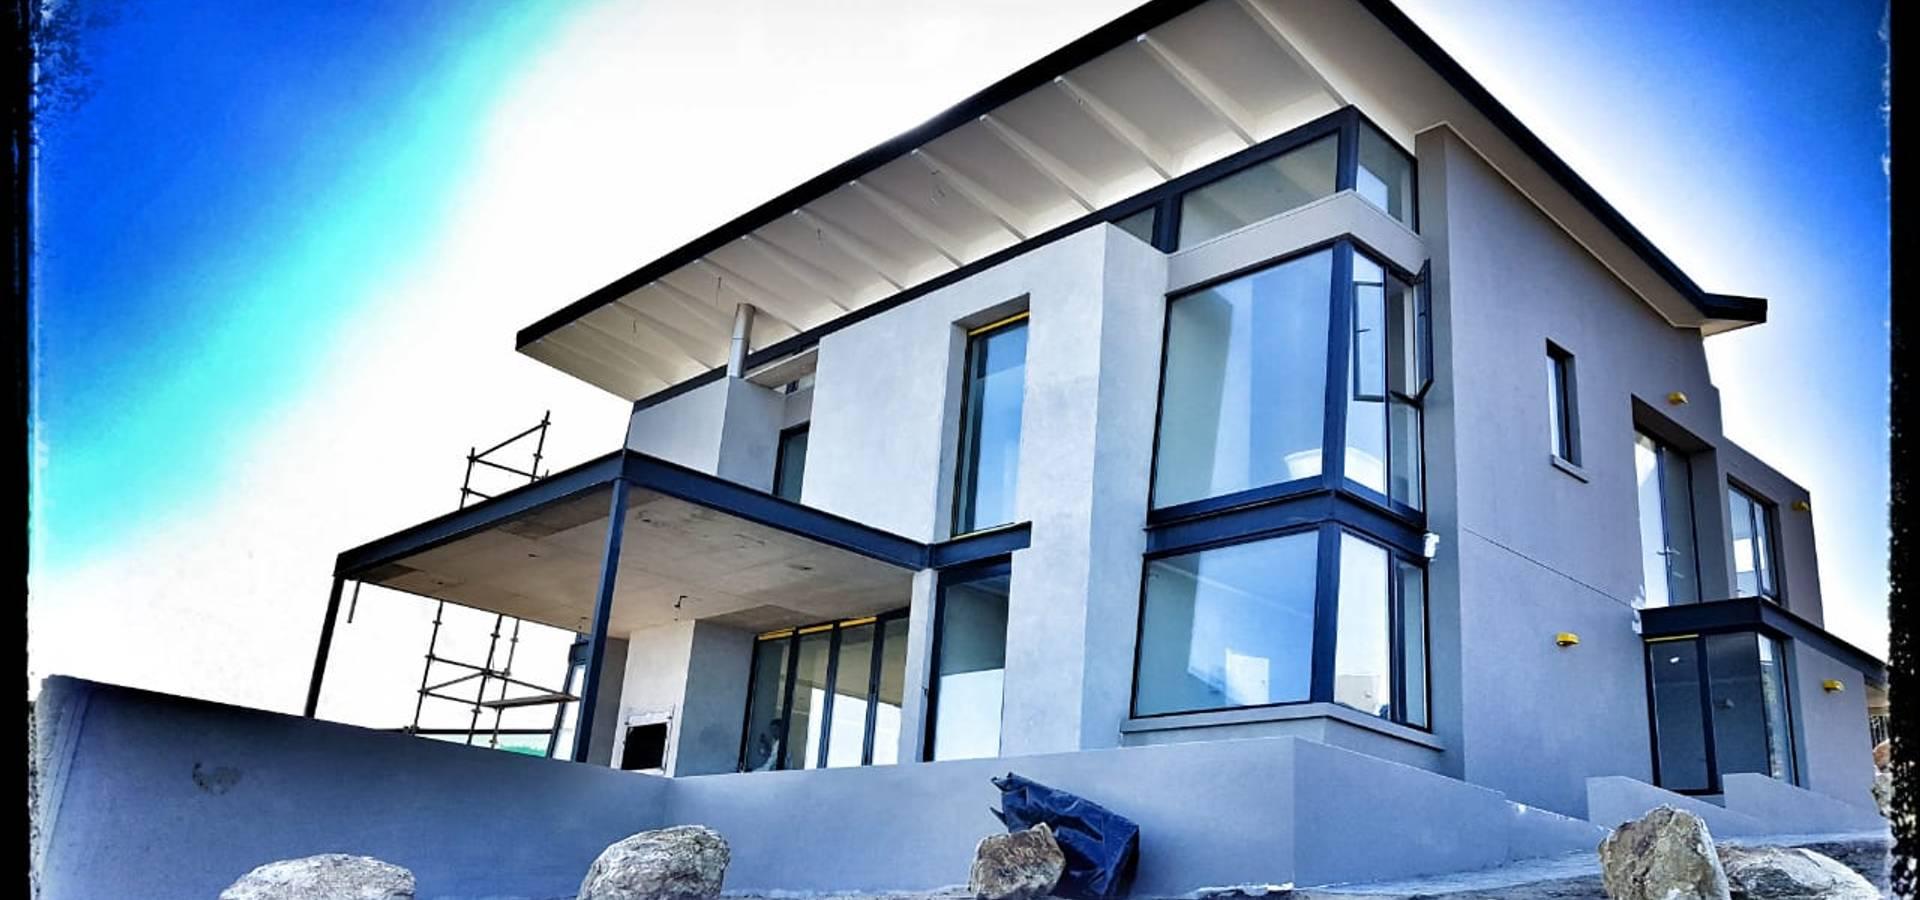 LEAF Architects